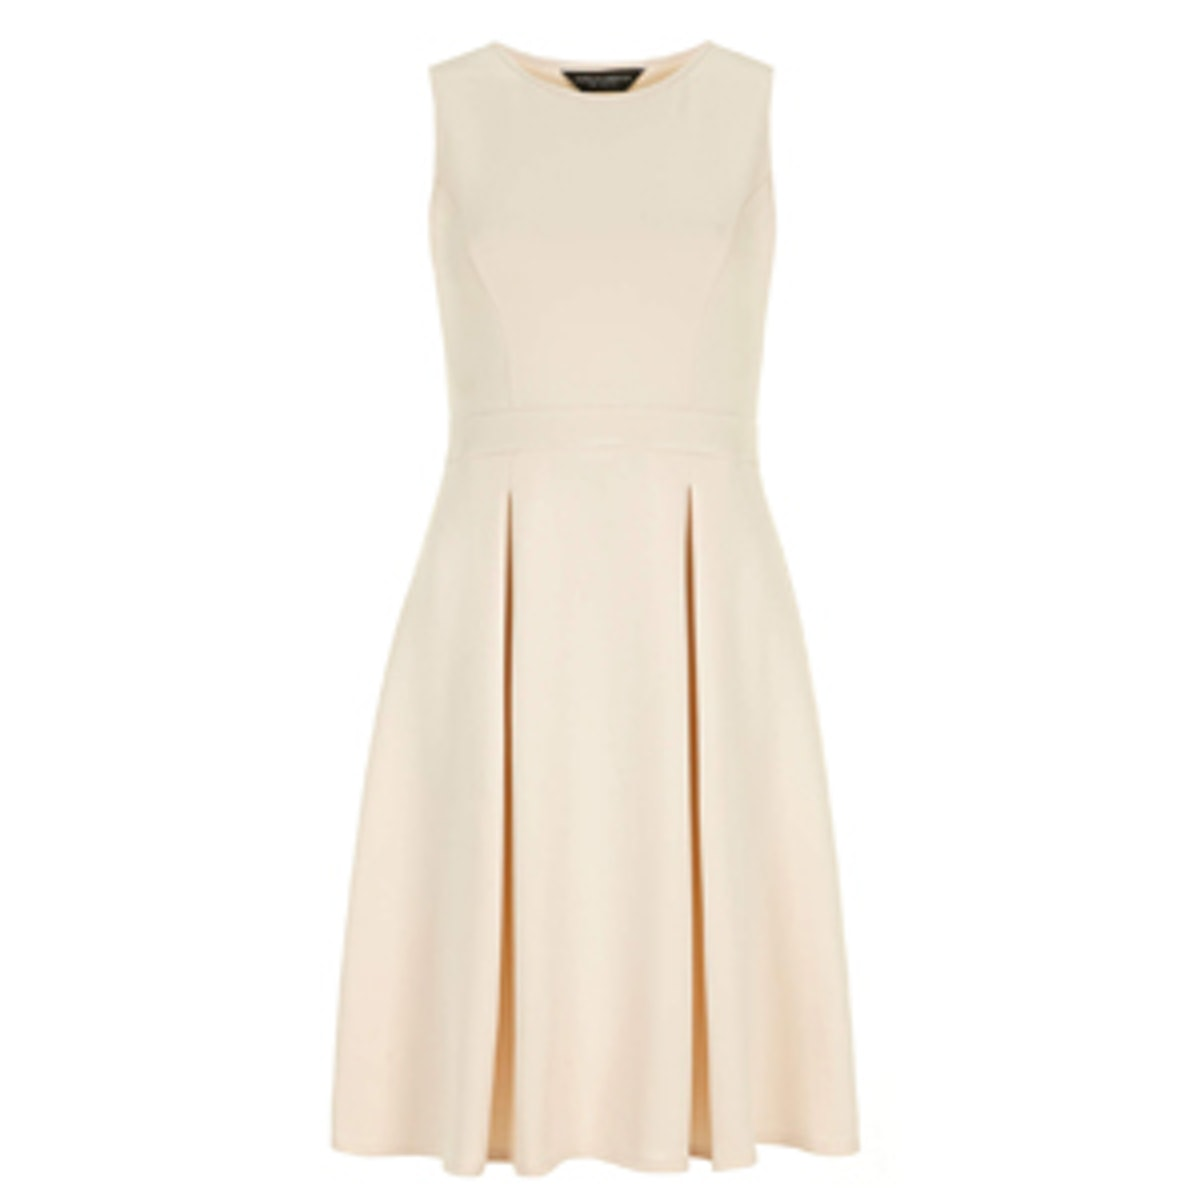 Nude Neoprene Midi Dress